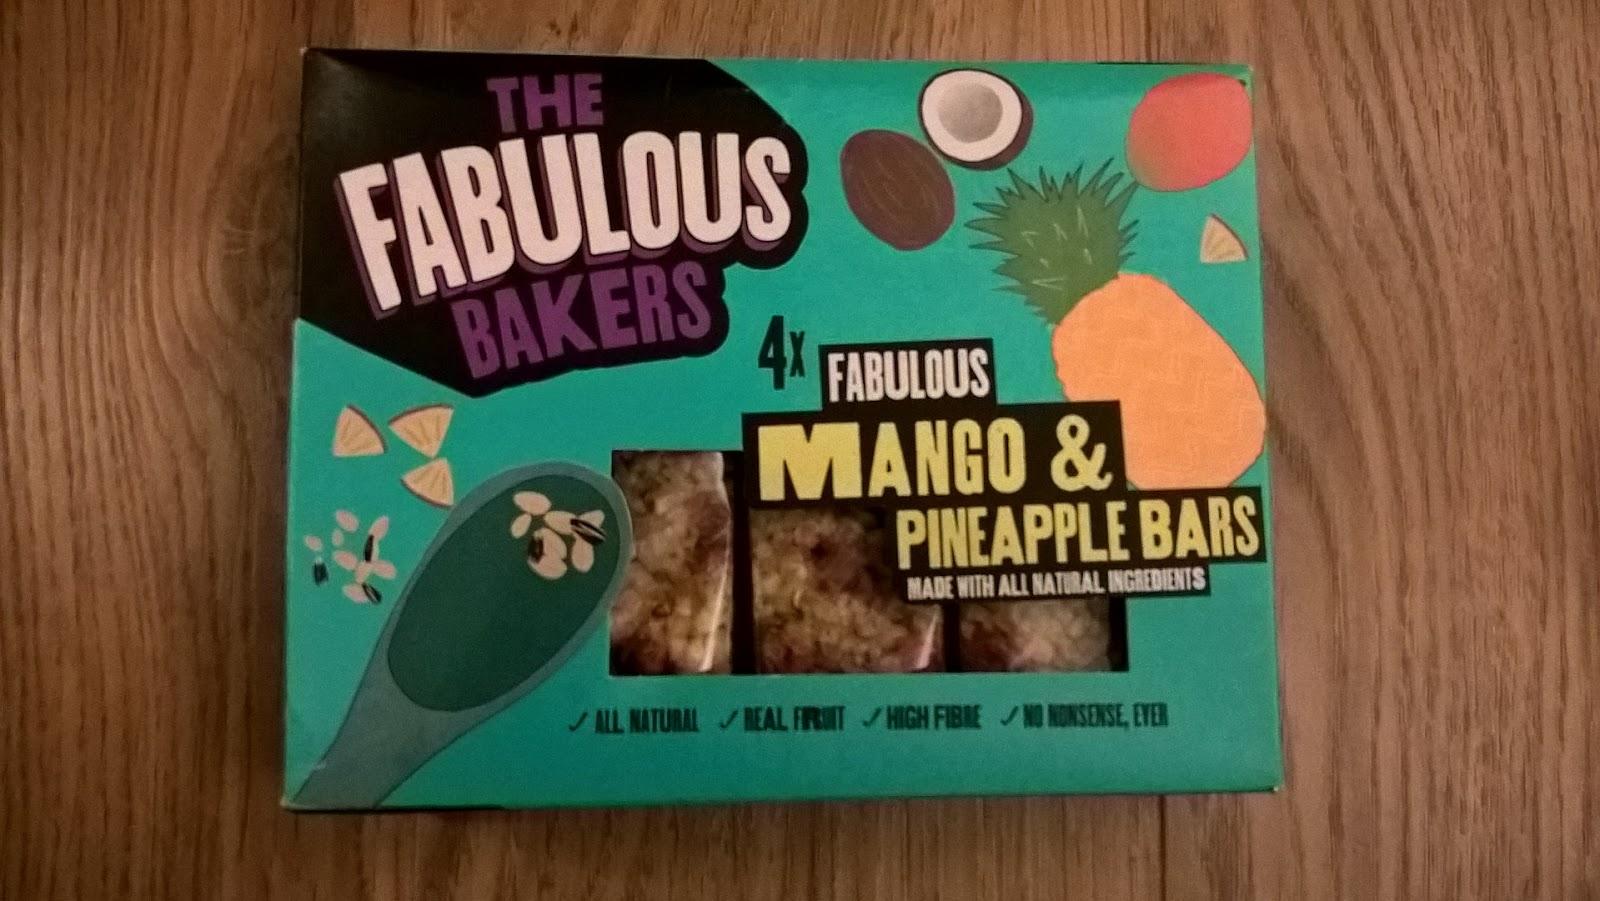 Fabulous Bakers Mango & Pineapple Bars - Degustabox Review - motherdistracted.co.uk